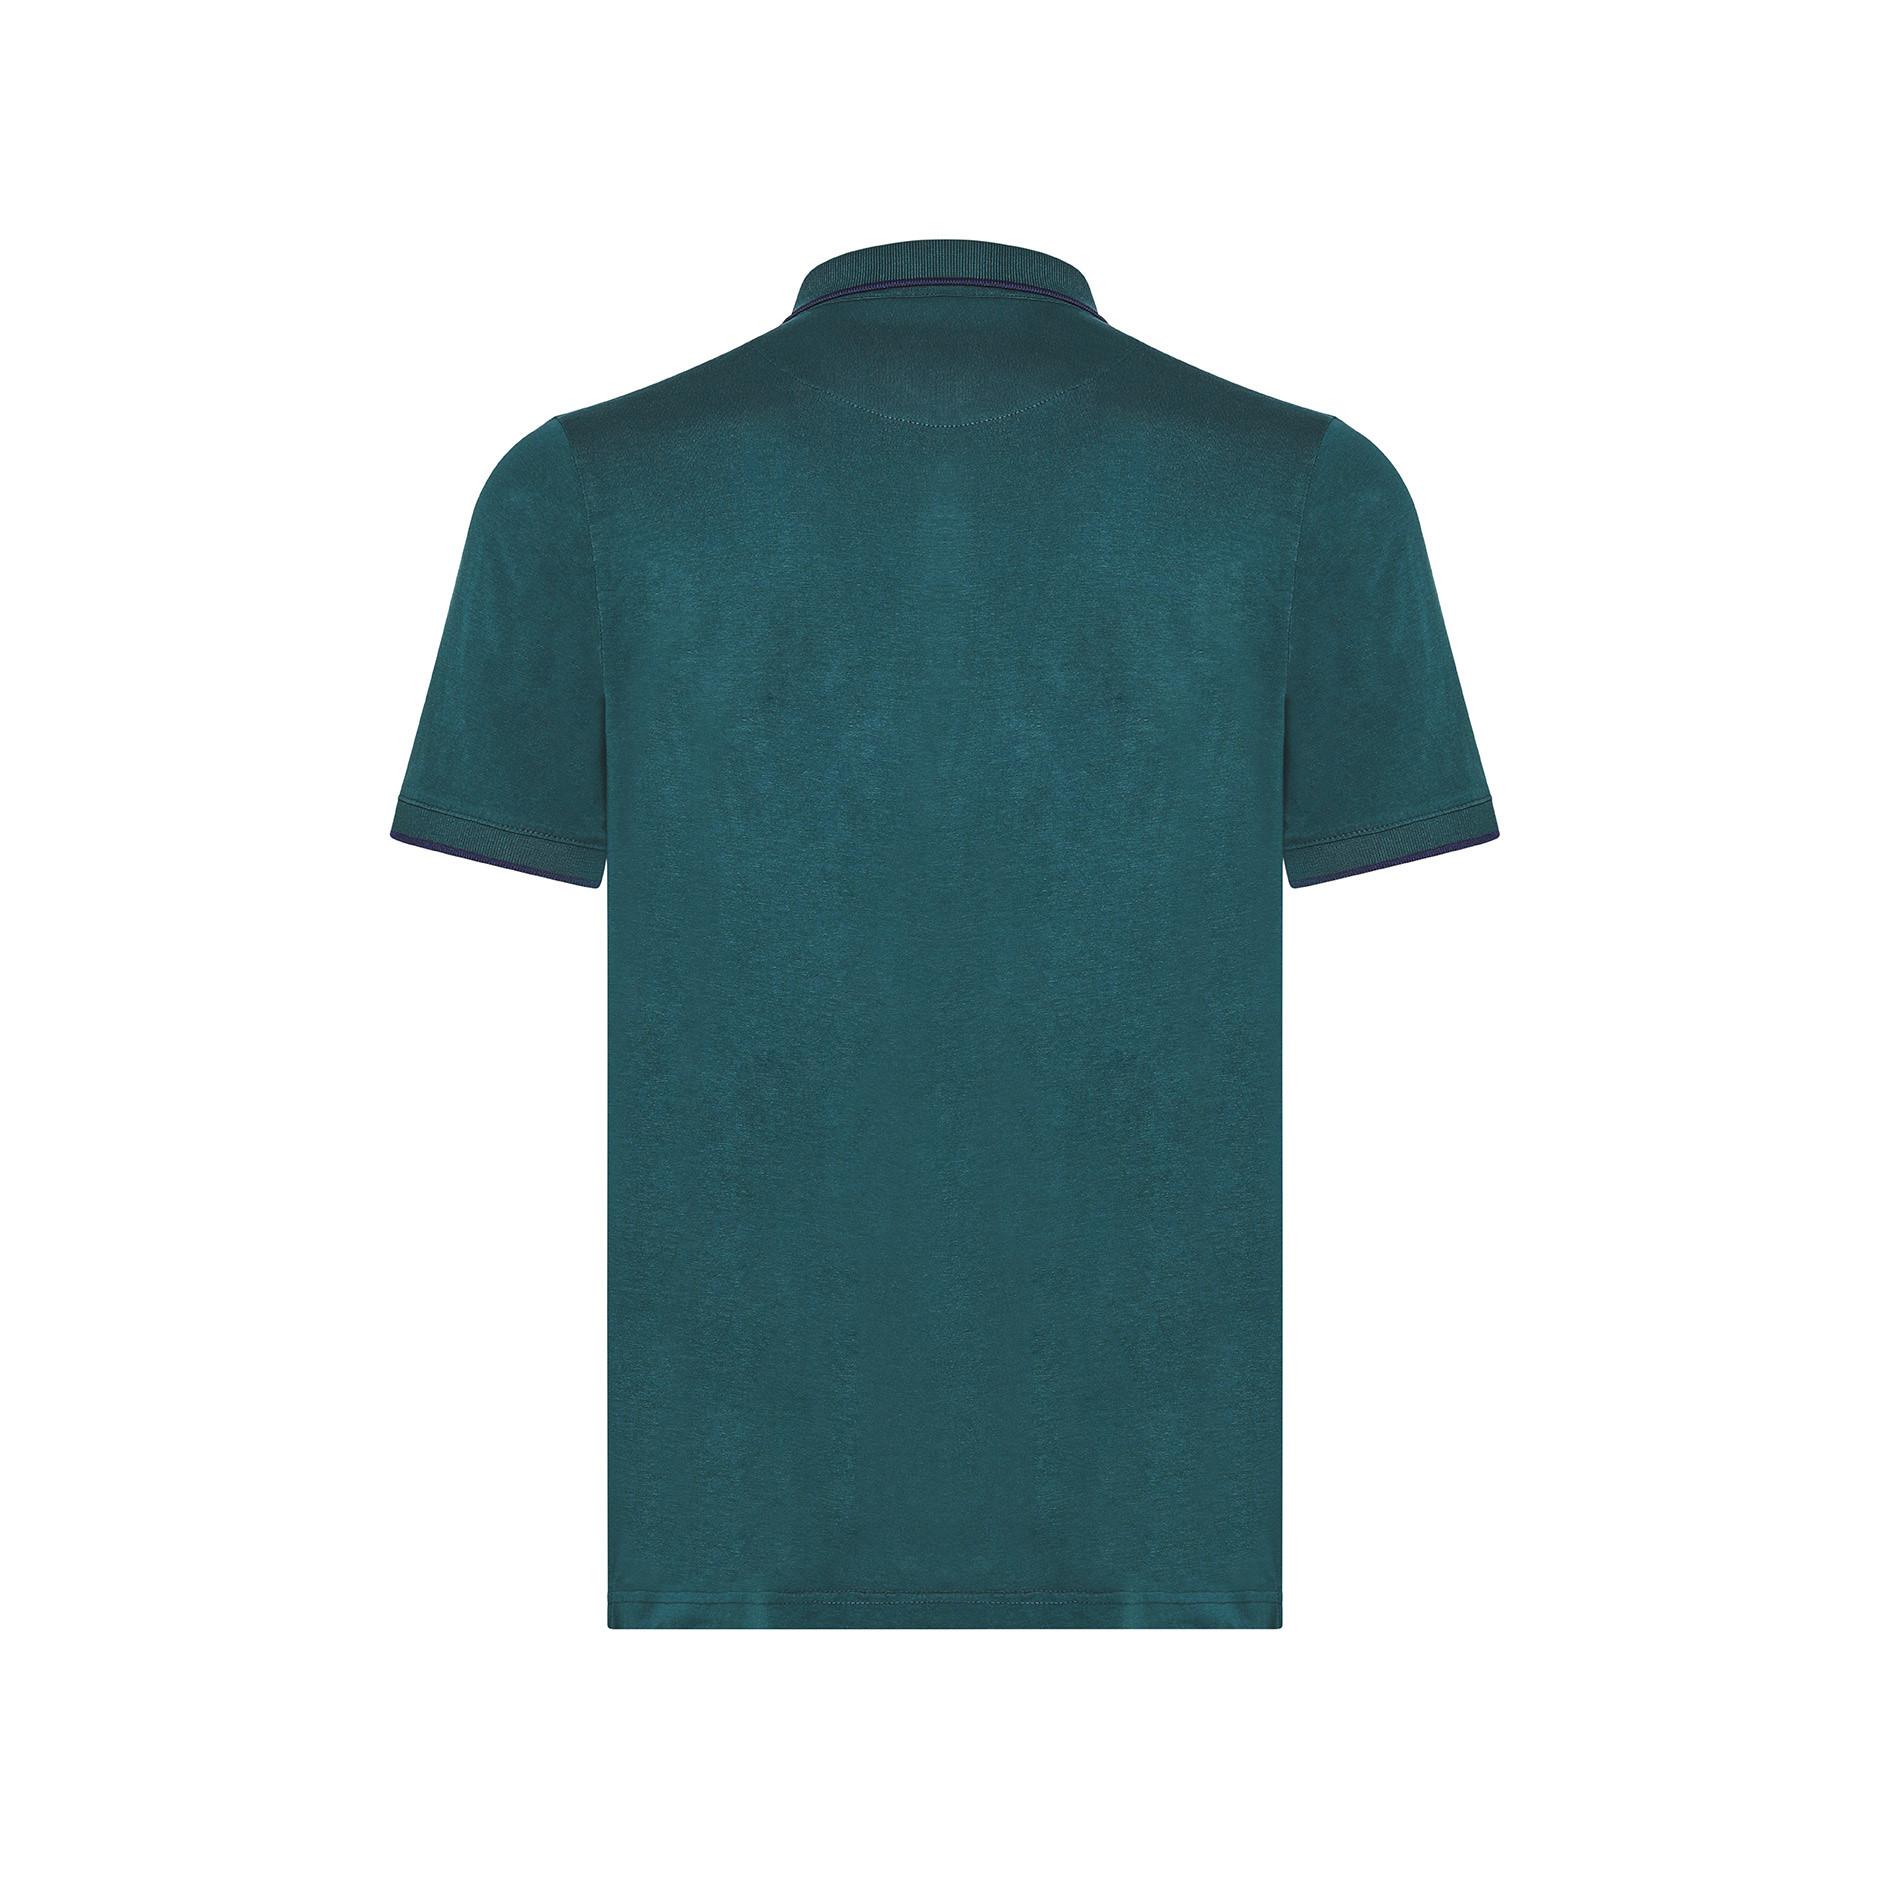 Polo cotone jersey Luca D'Altieri, Verde scuro, large image number 1